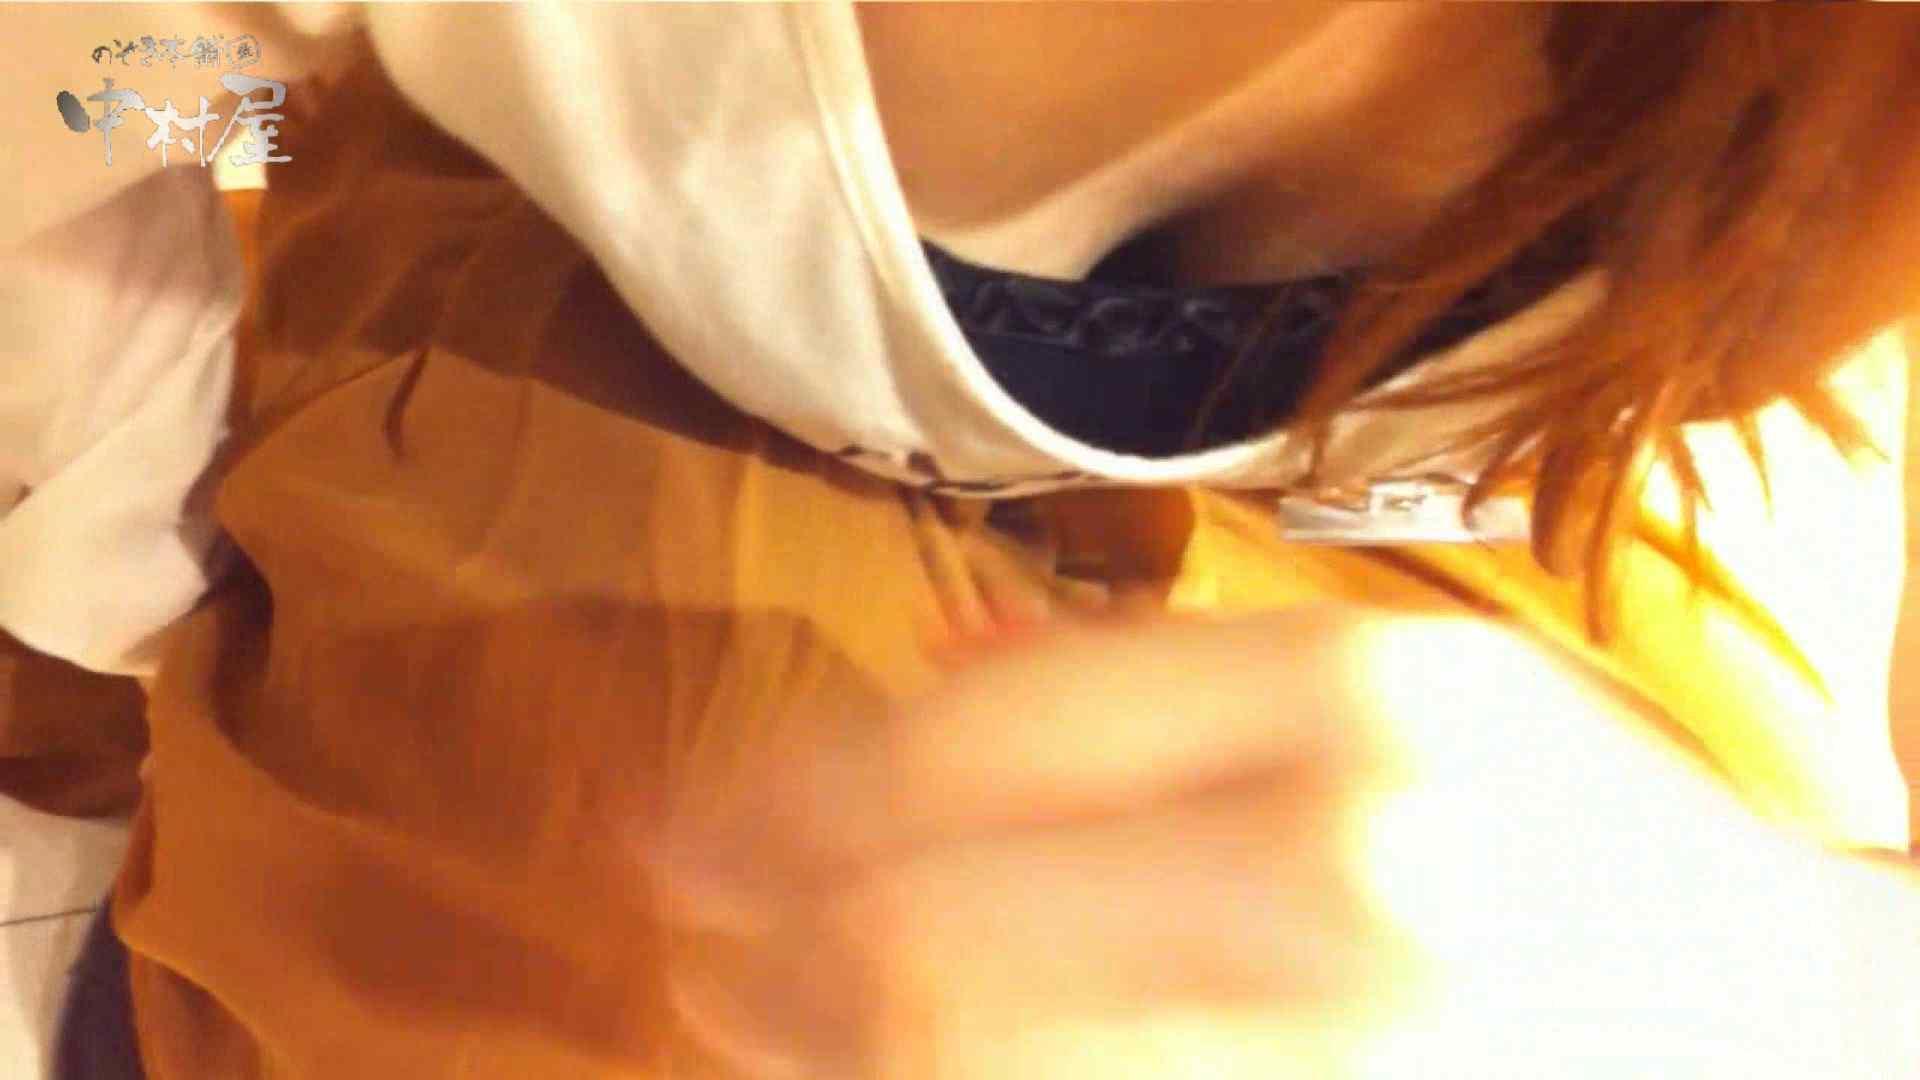 vol.84 美人アパレル胸チラ&パンチラ 帽子オネェさんに胸元アタック! チラ 盗撮オマンコ無修正動画無料 51PICs 3